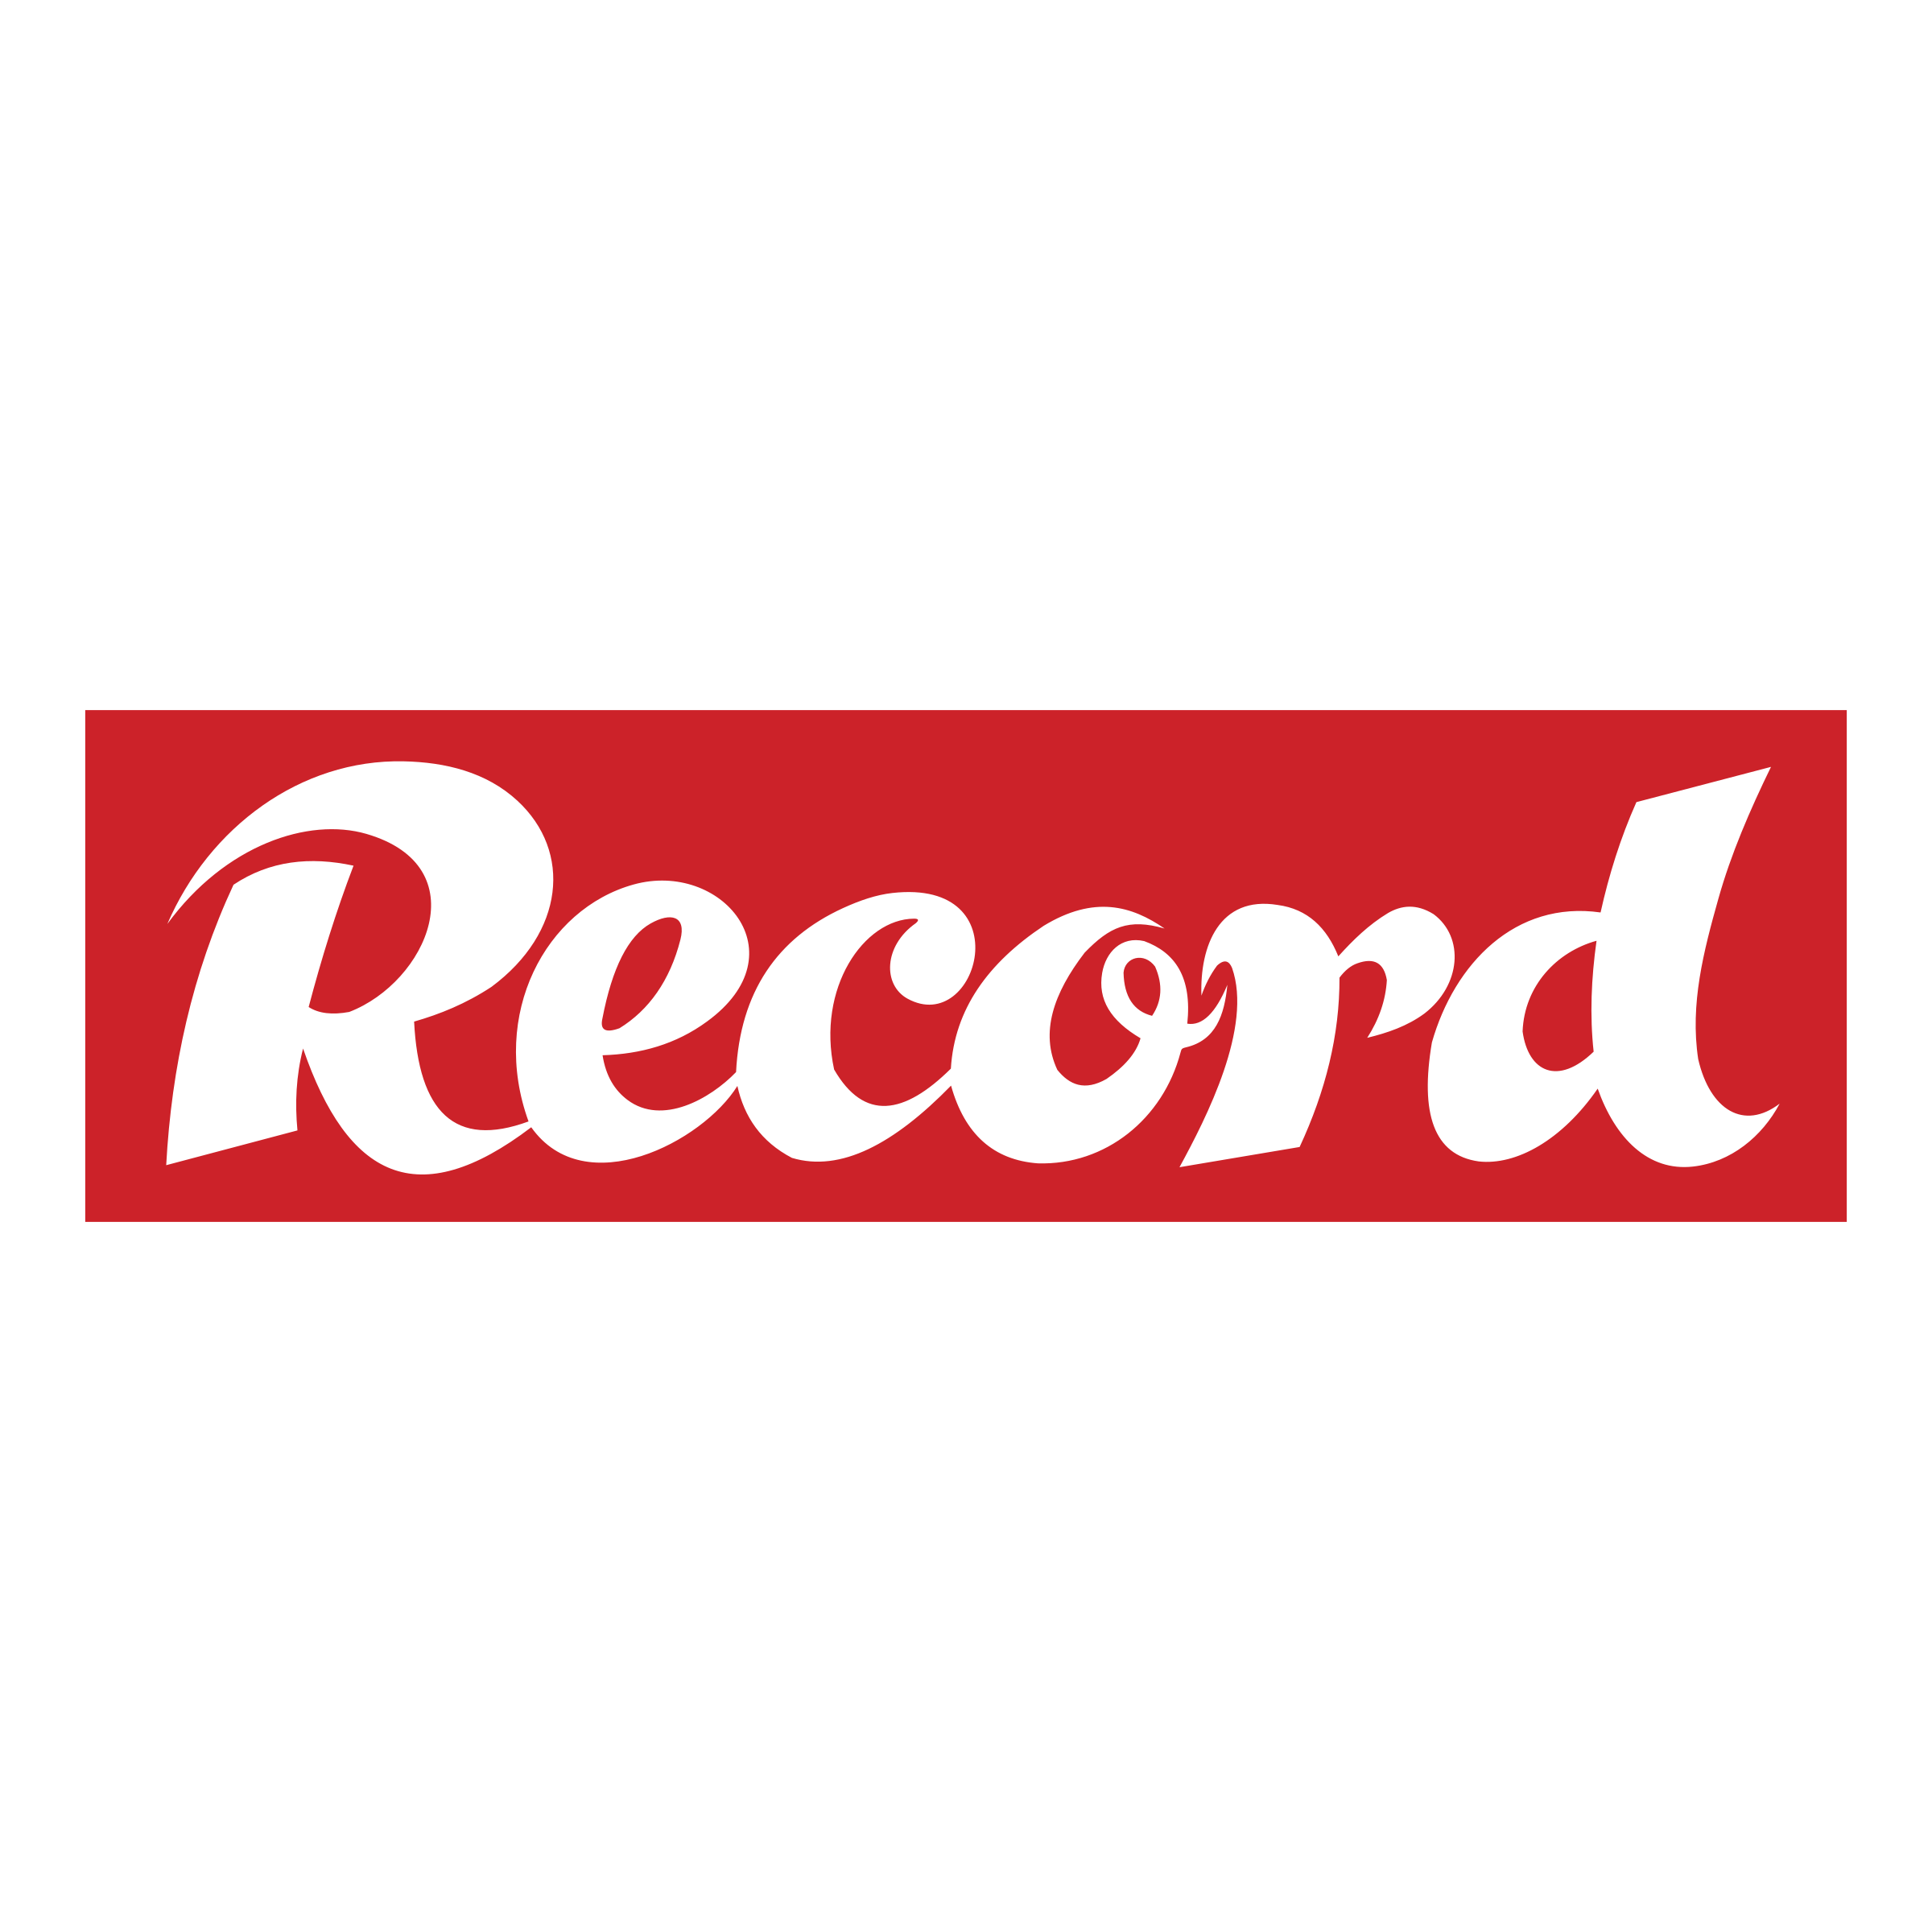 Record Logo PNG Transparent & SVG Vector.